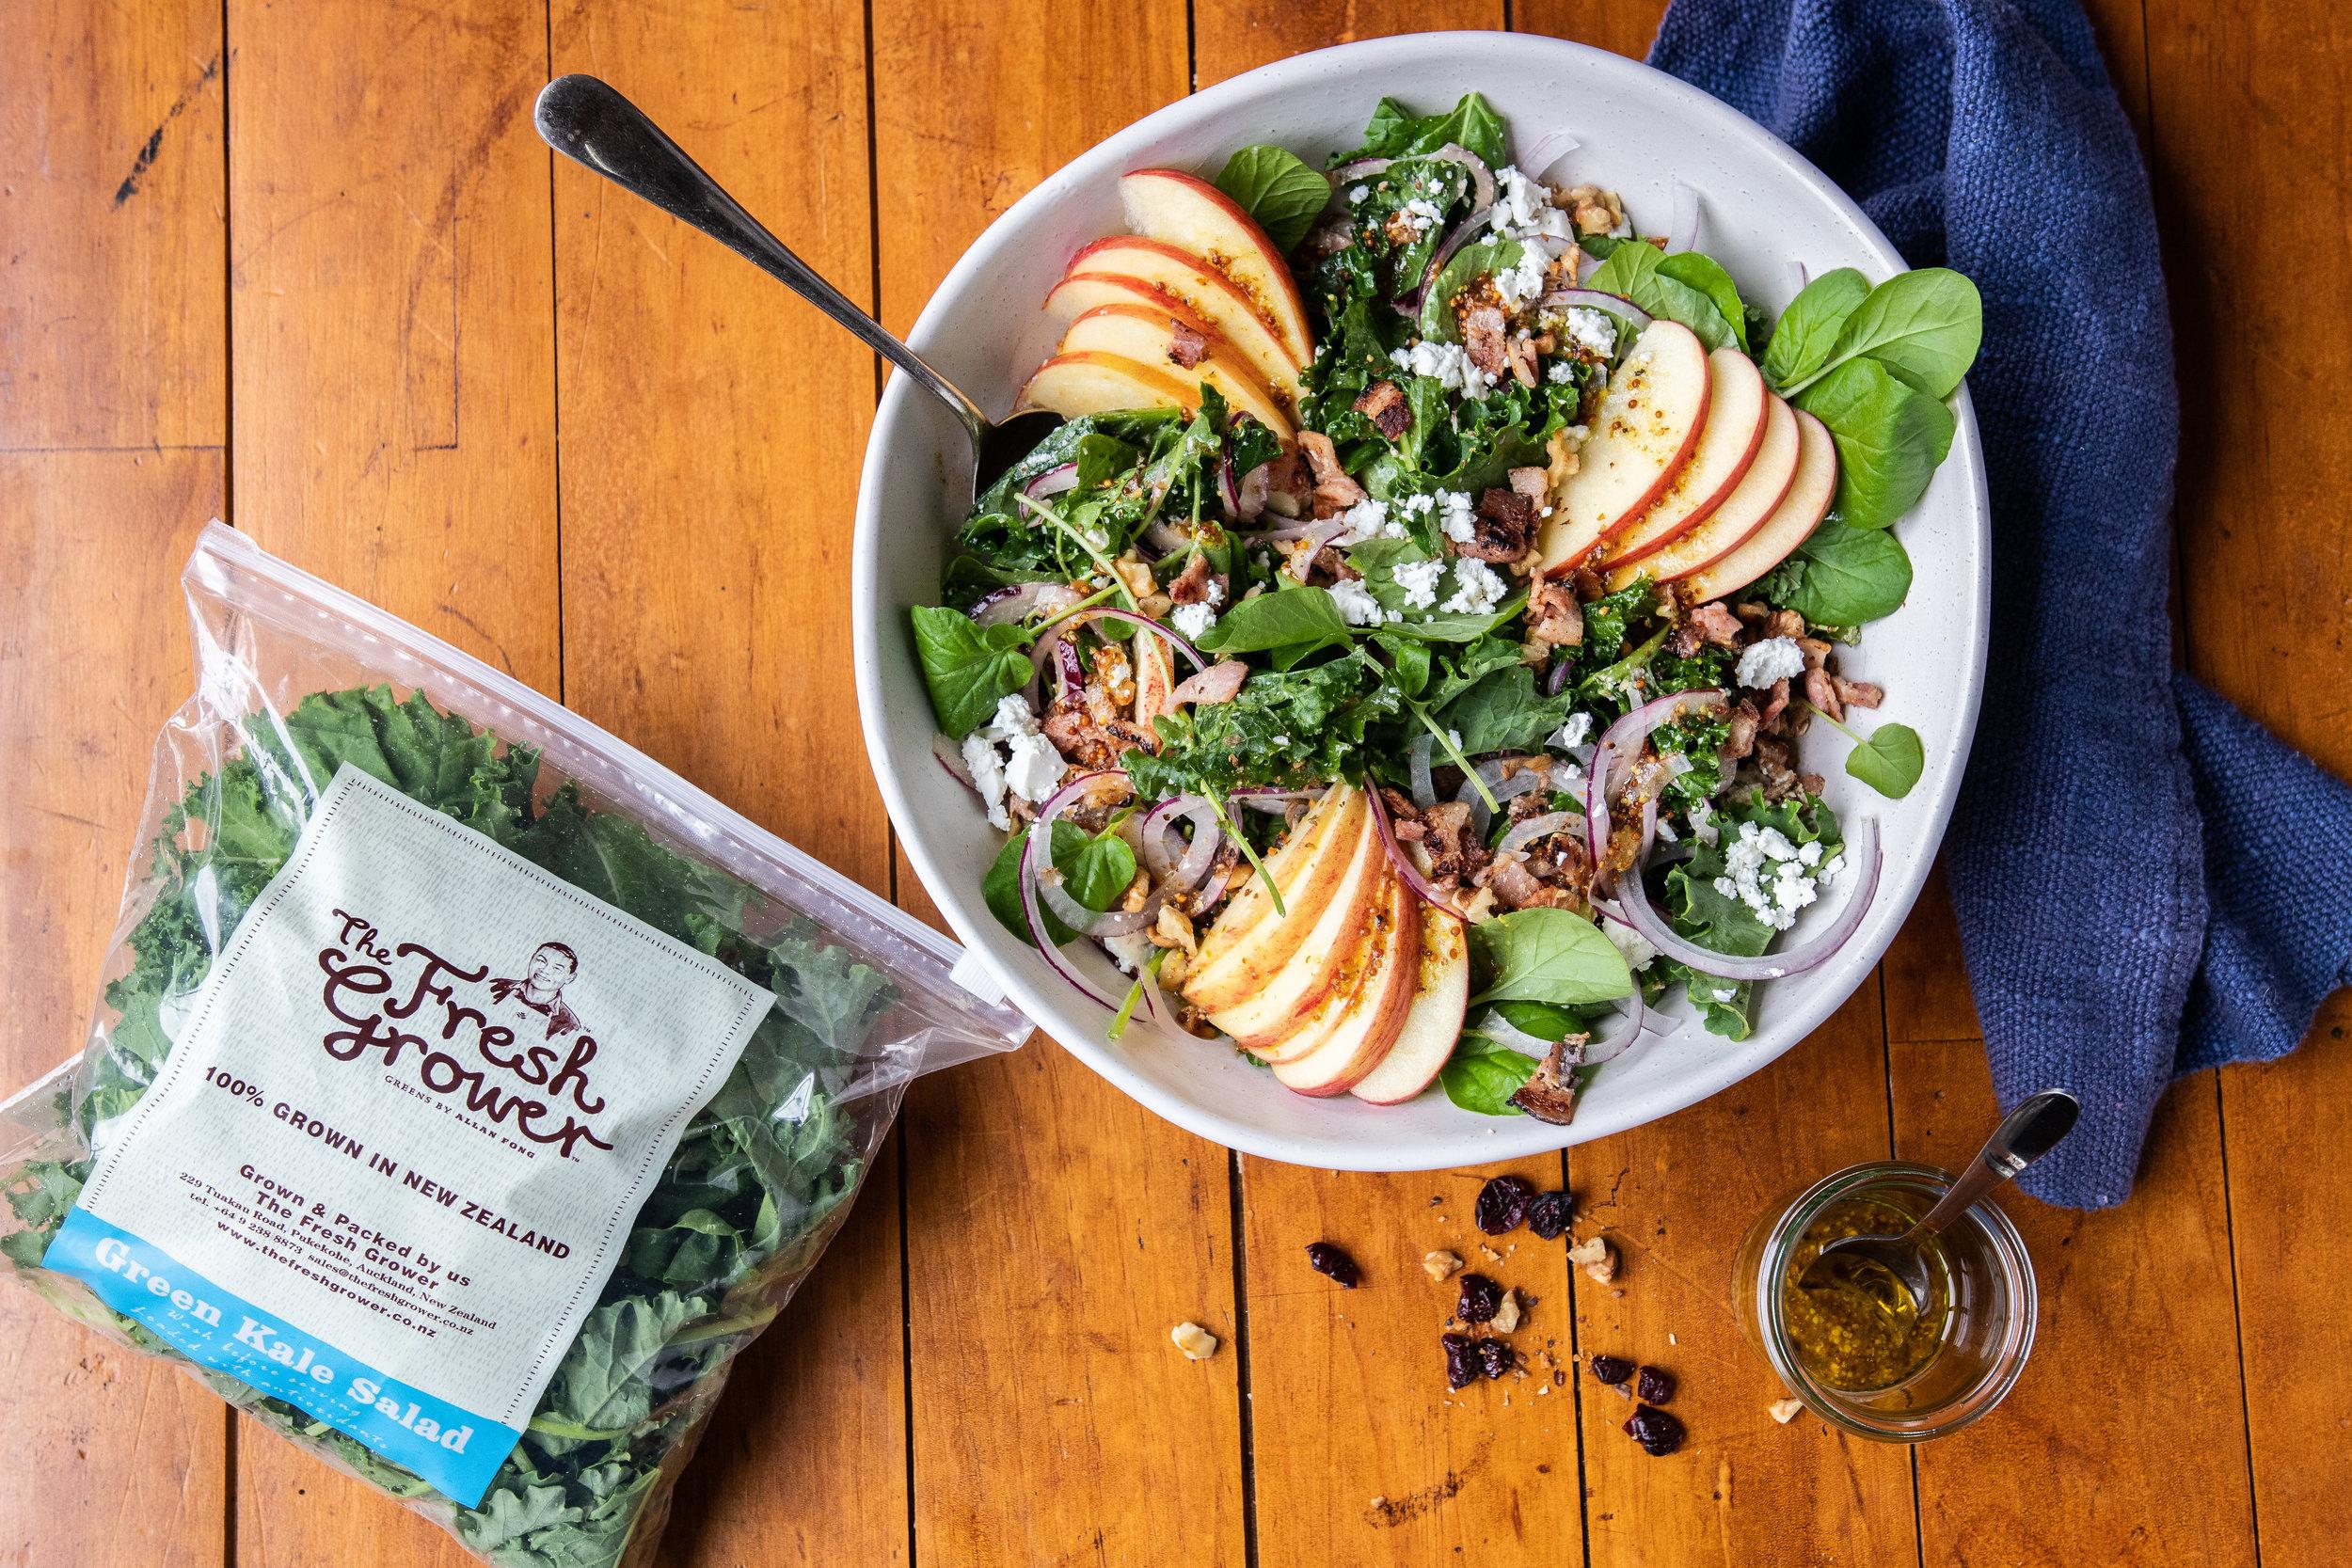 Winter Apple & Kale Salad, The Fresh Grower.jpg